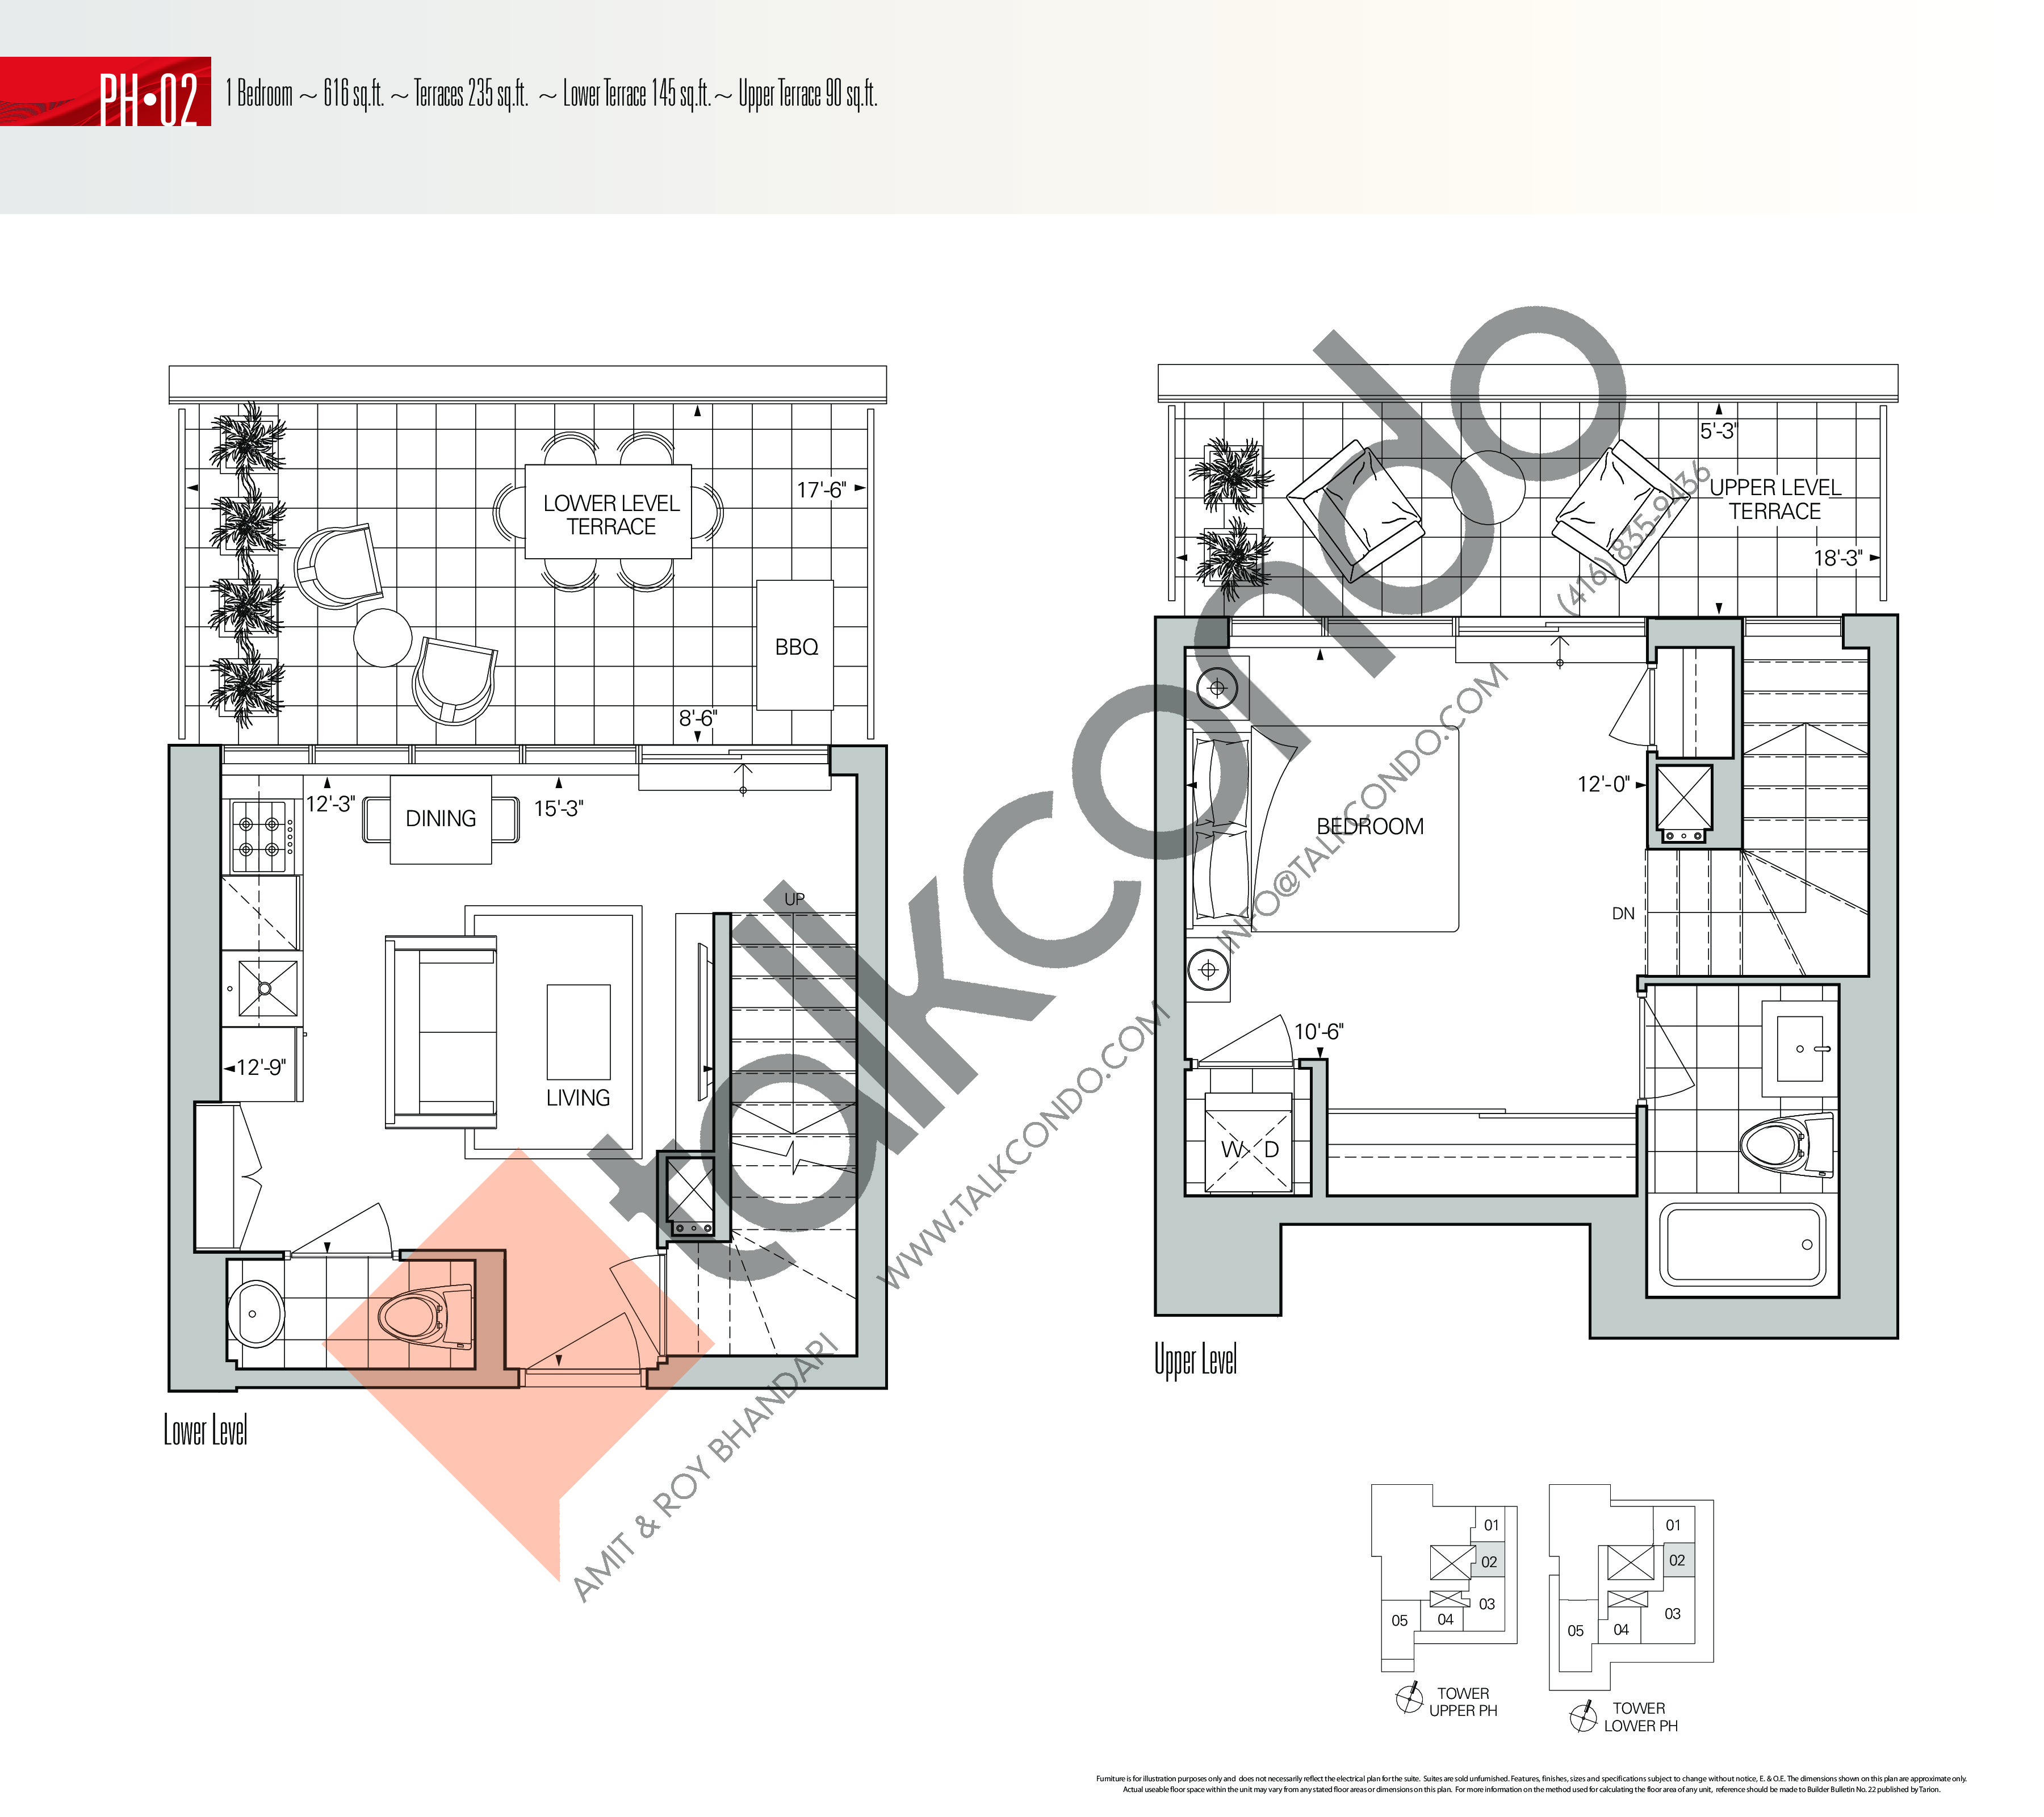 PH-02 Floor Plan at Rise Condos - 616 sq.ft